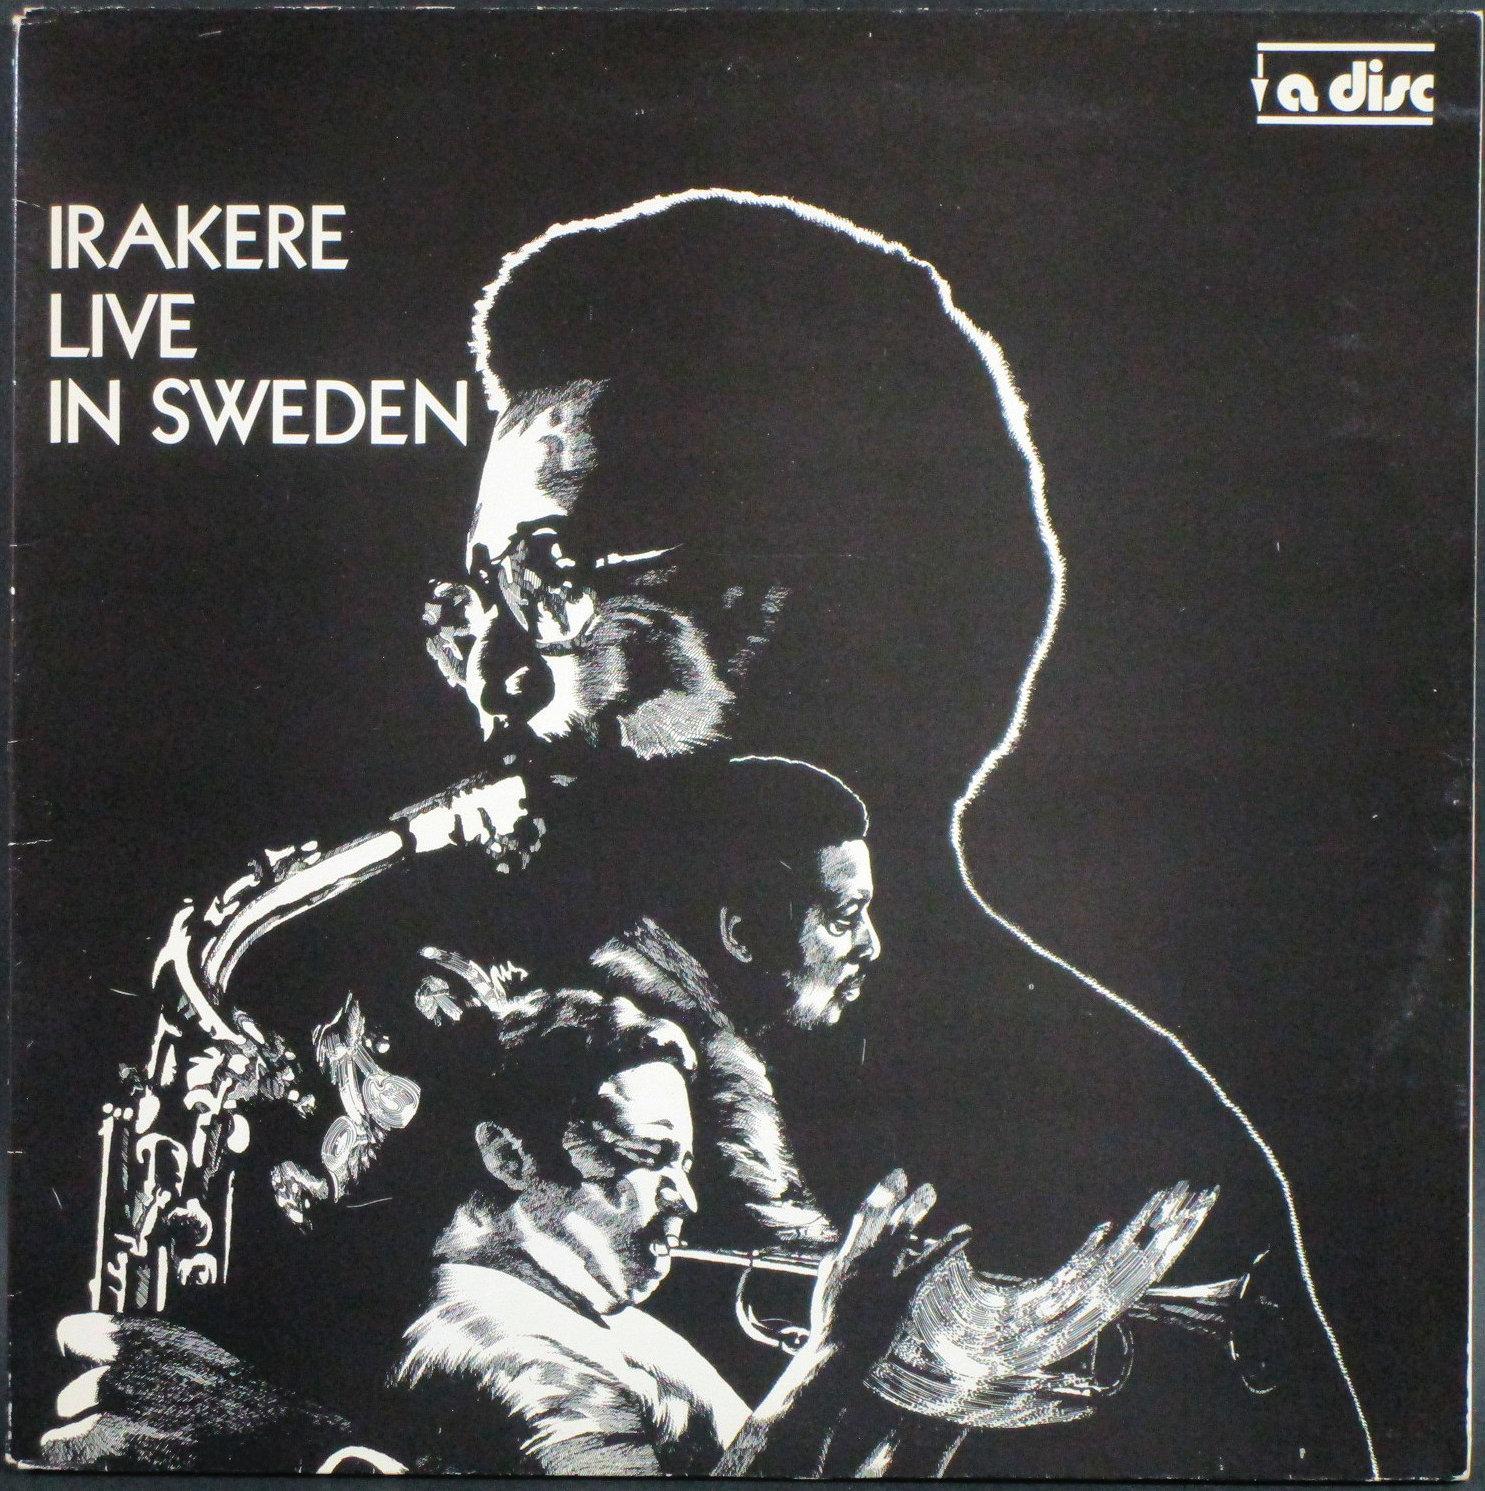 Irakere イラケレ / Live In Sweden